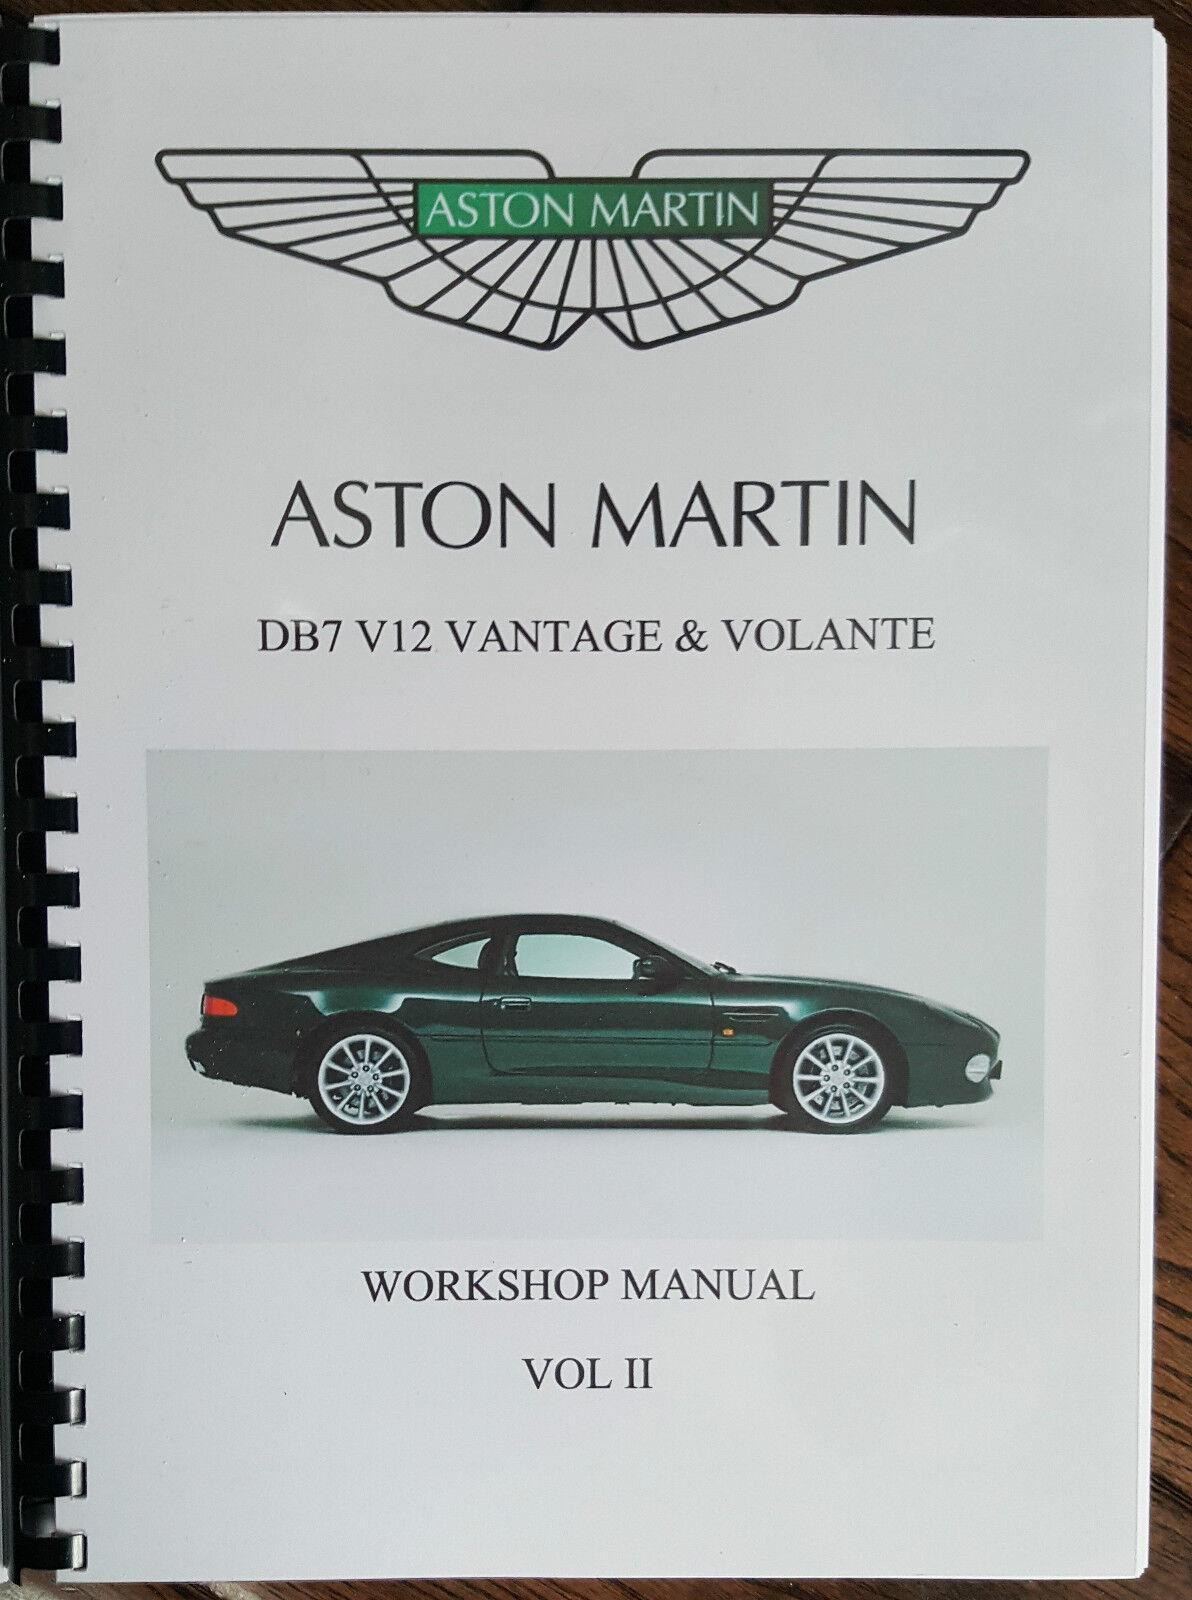 3 of 5 Aston Martin Db7 V12 Vantage & Volante Workshop Manual 99-03  Reprinted Full 4 of 5 Aston Martin ...